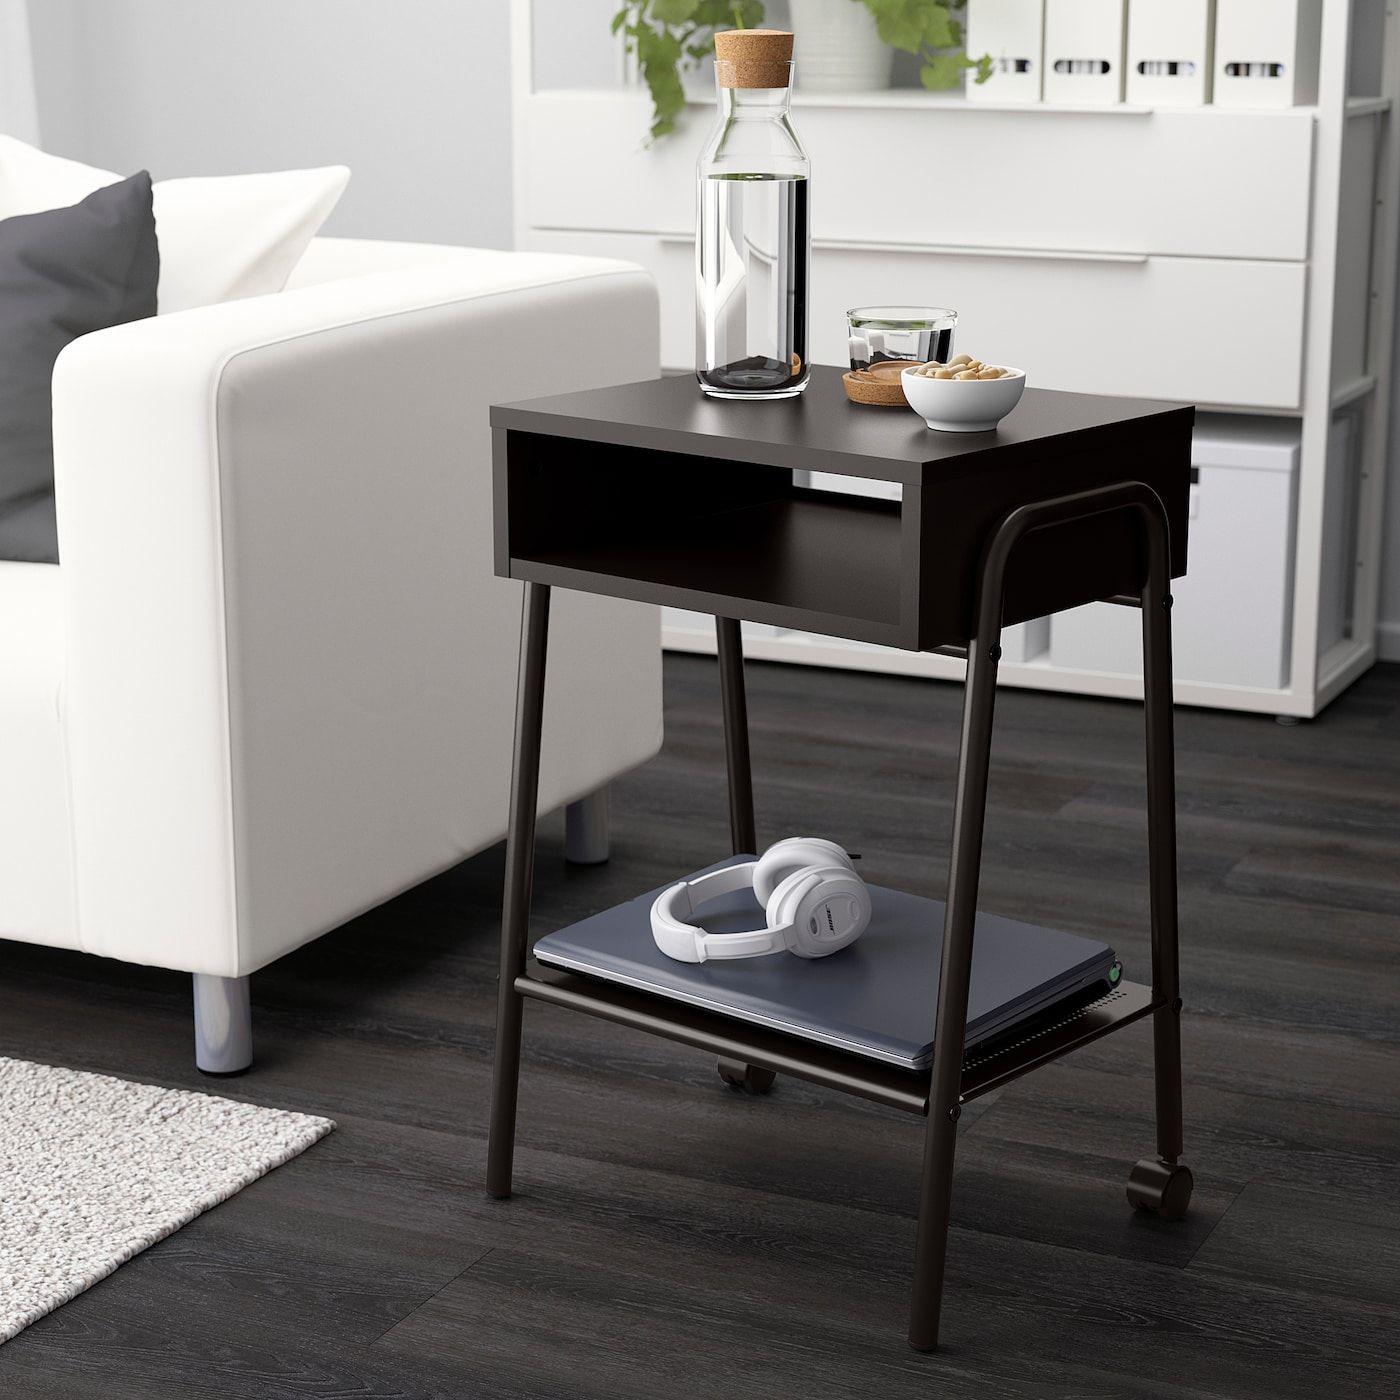 Setskog Nightstand Black 17 3 4x13 3 4 Ikea Black Bedside Table Bedside Table Nightstand [ 1400 x 1400 Pixel ]